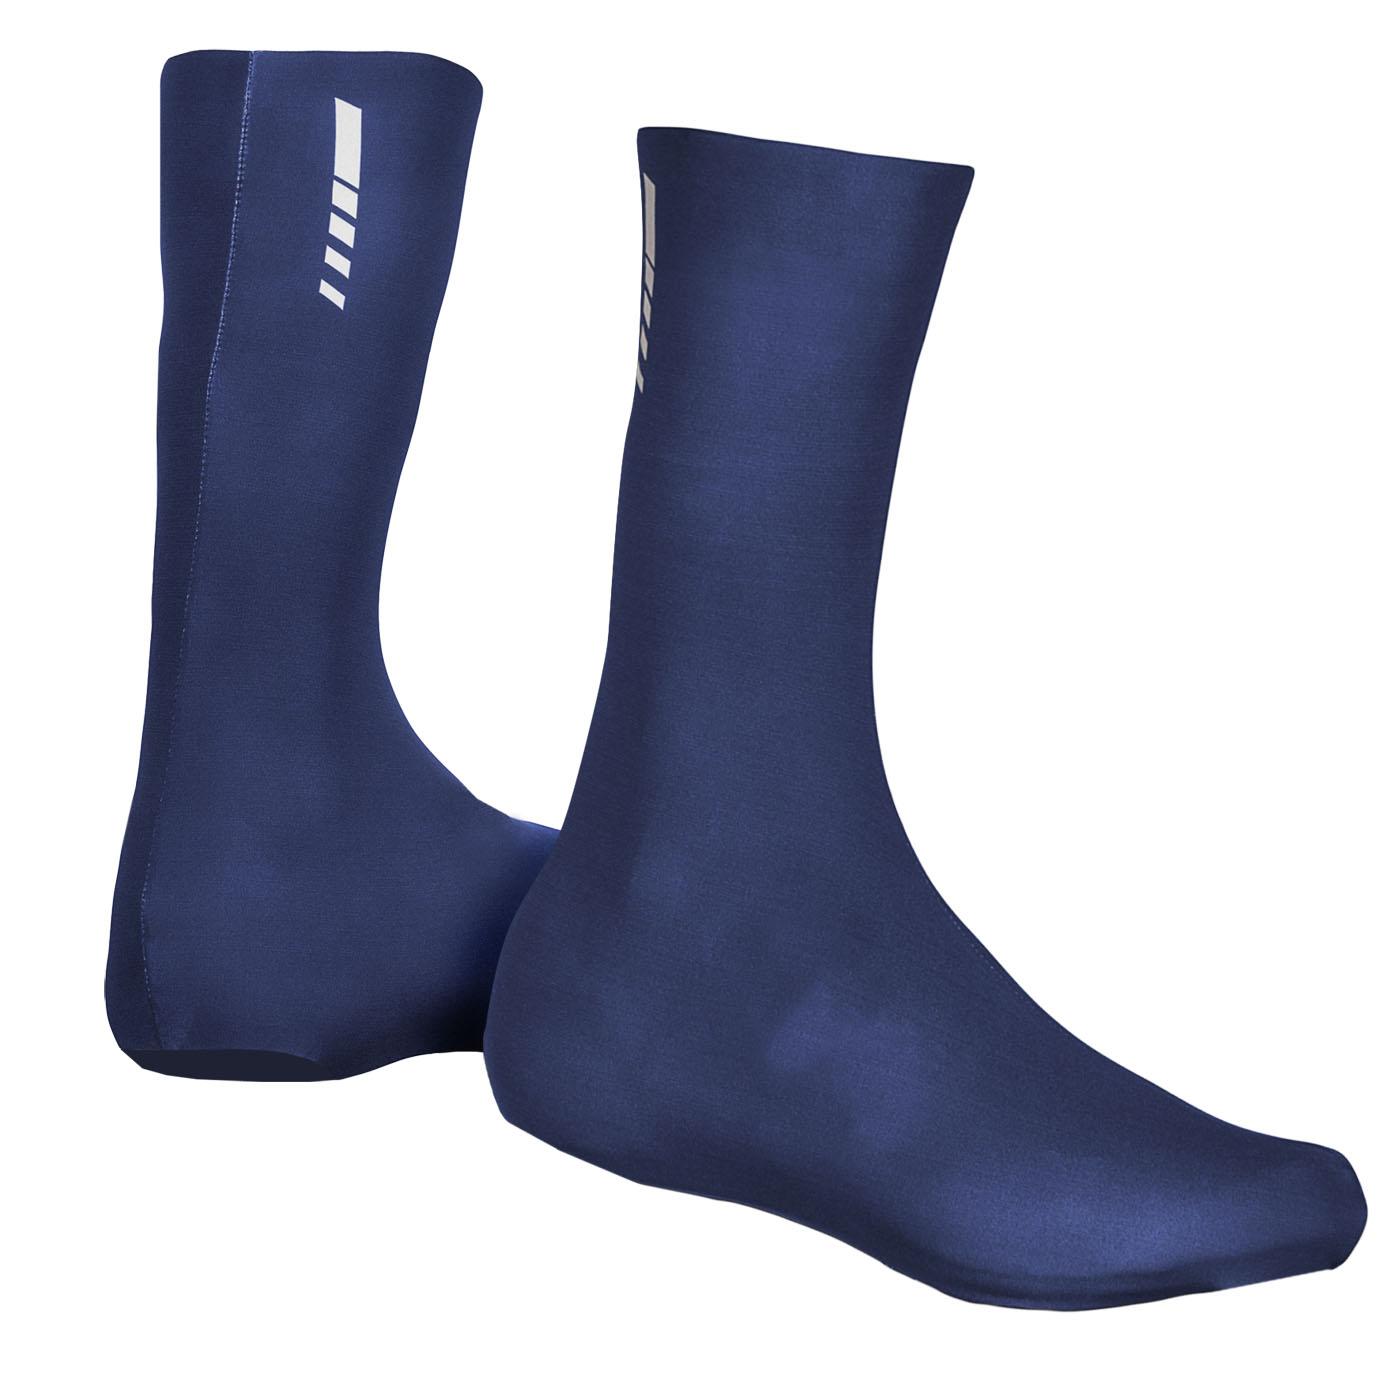 GripGrab RaceAero TT Raceday Lycra Shoe Cover 2 - Navy Blue